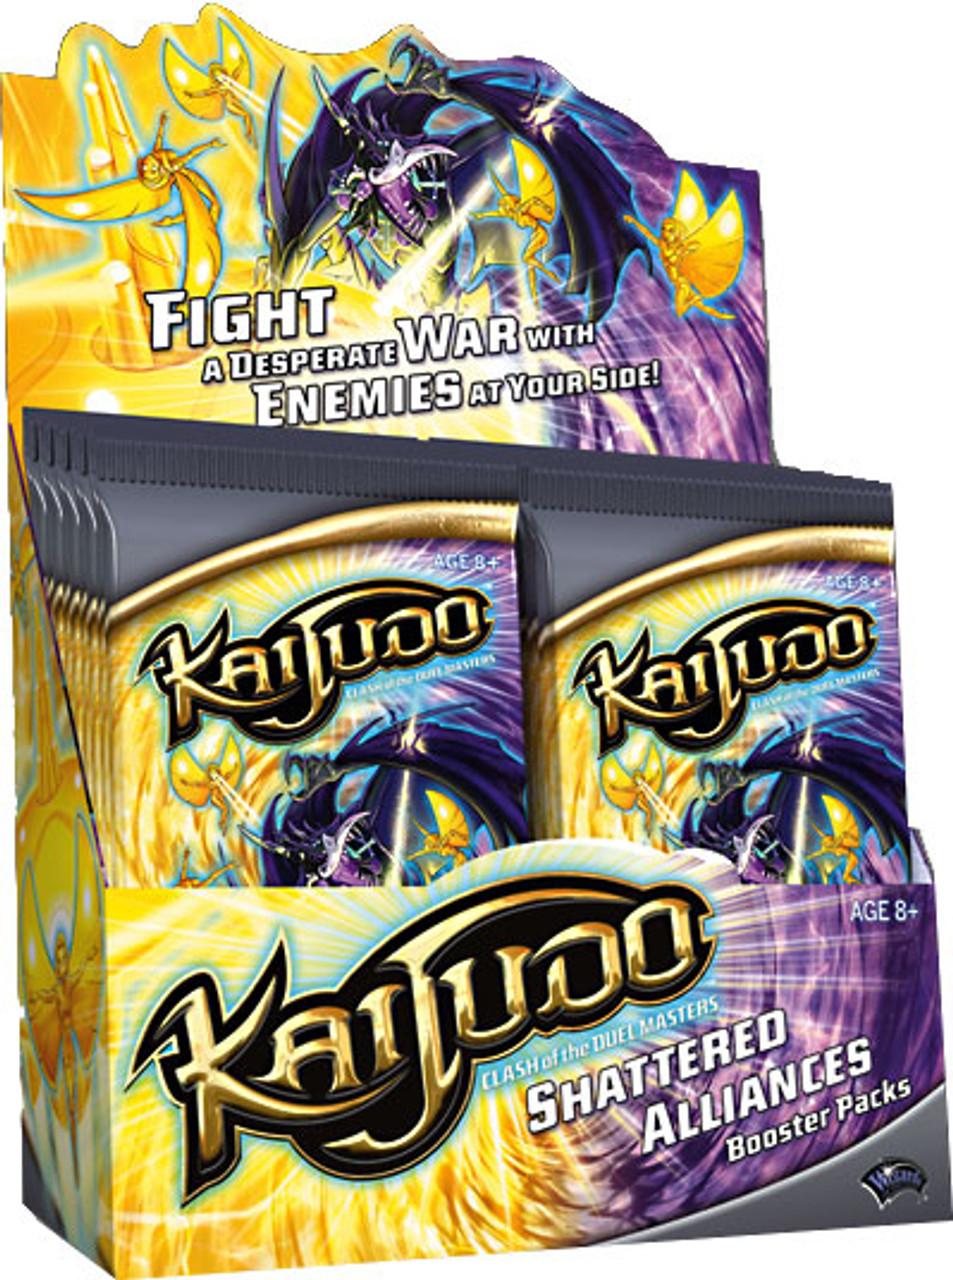 Kaijudo Shattered Alliances Booster Box [24 Packs]